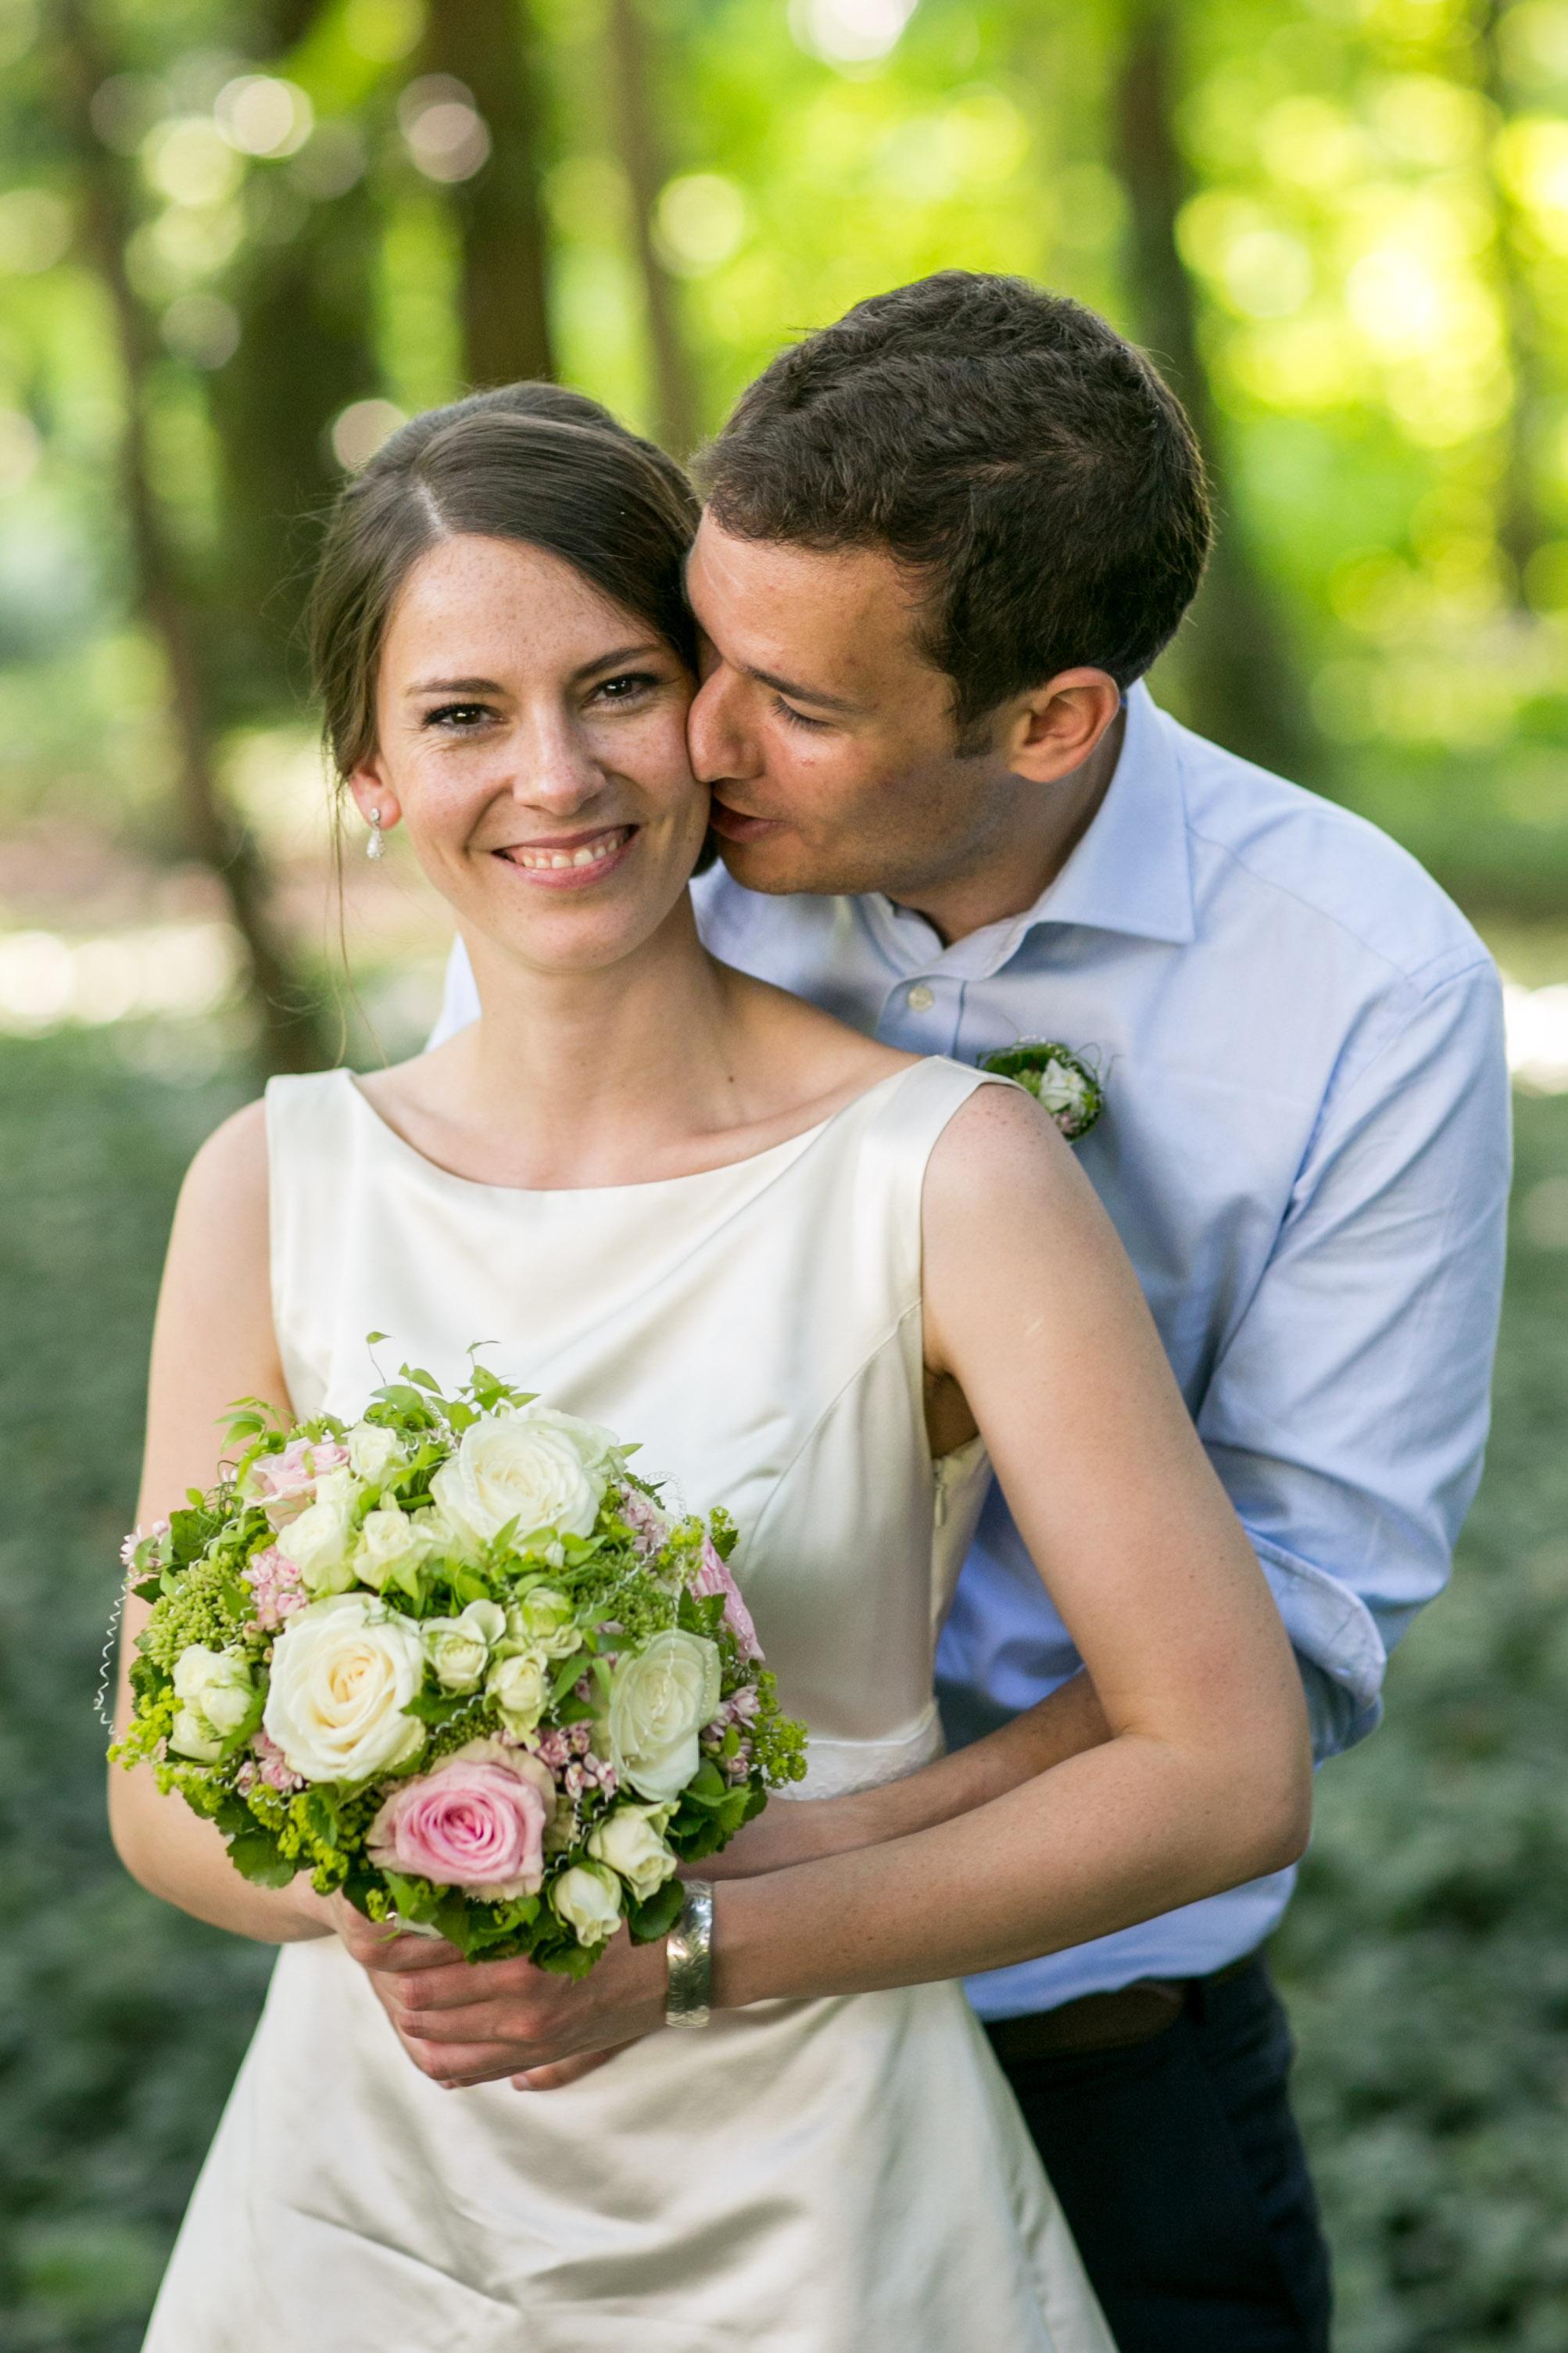 Fran Burrows Hochzeitsfotografie_shopandmarry.de-22